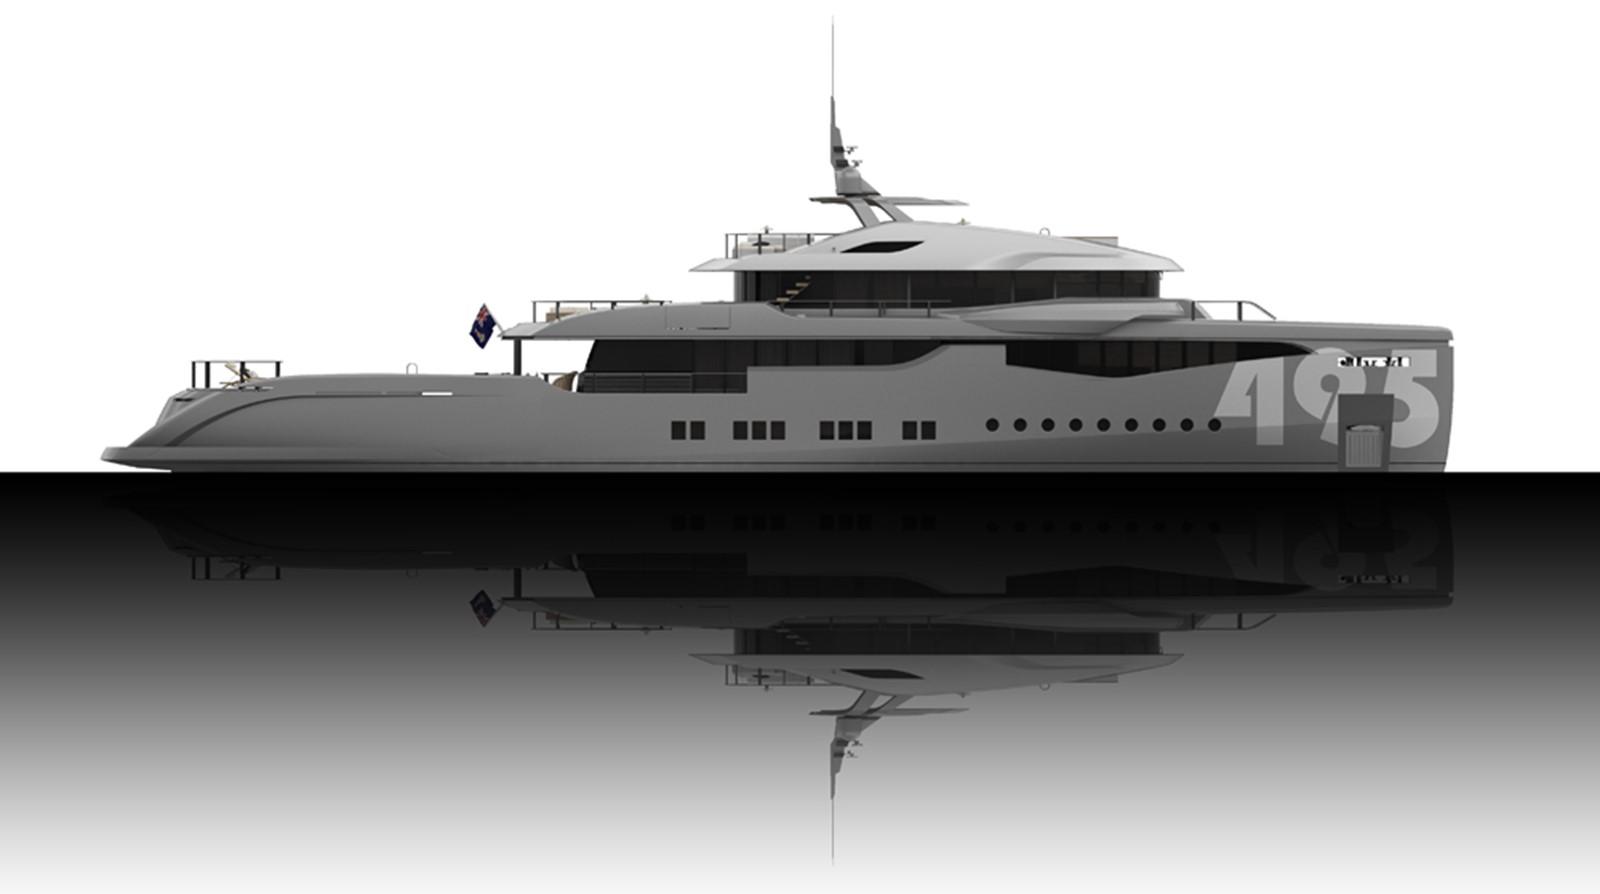 2021 RMK MARINE SHIPYARDS, TURKEY RMK 5000 EVO Explorer  Motor Yacht 1922554